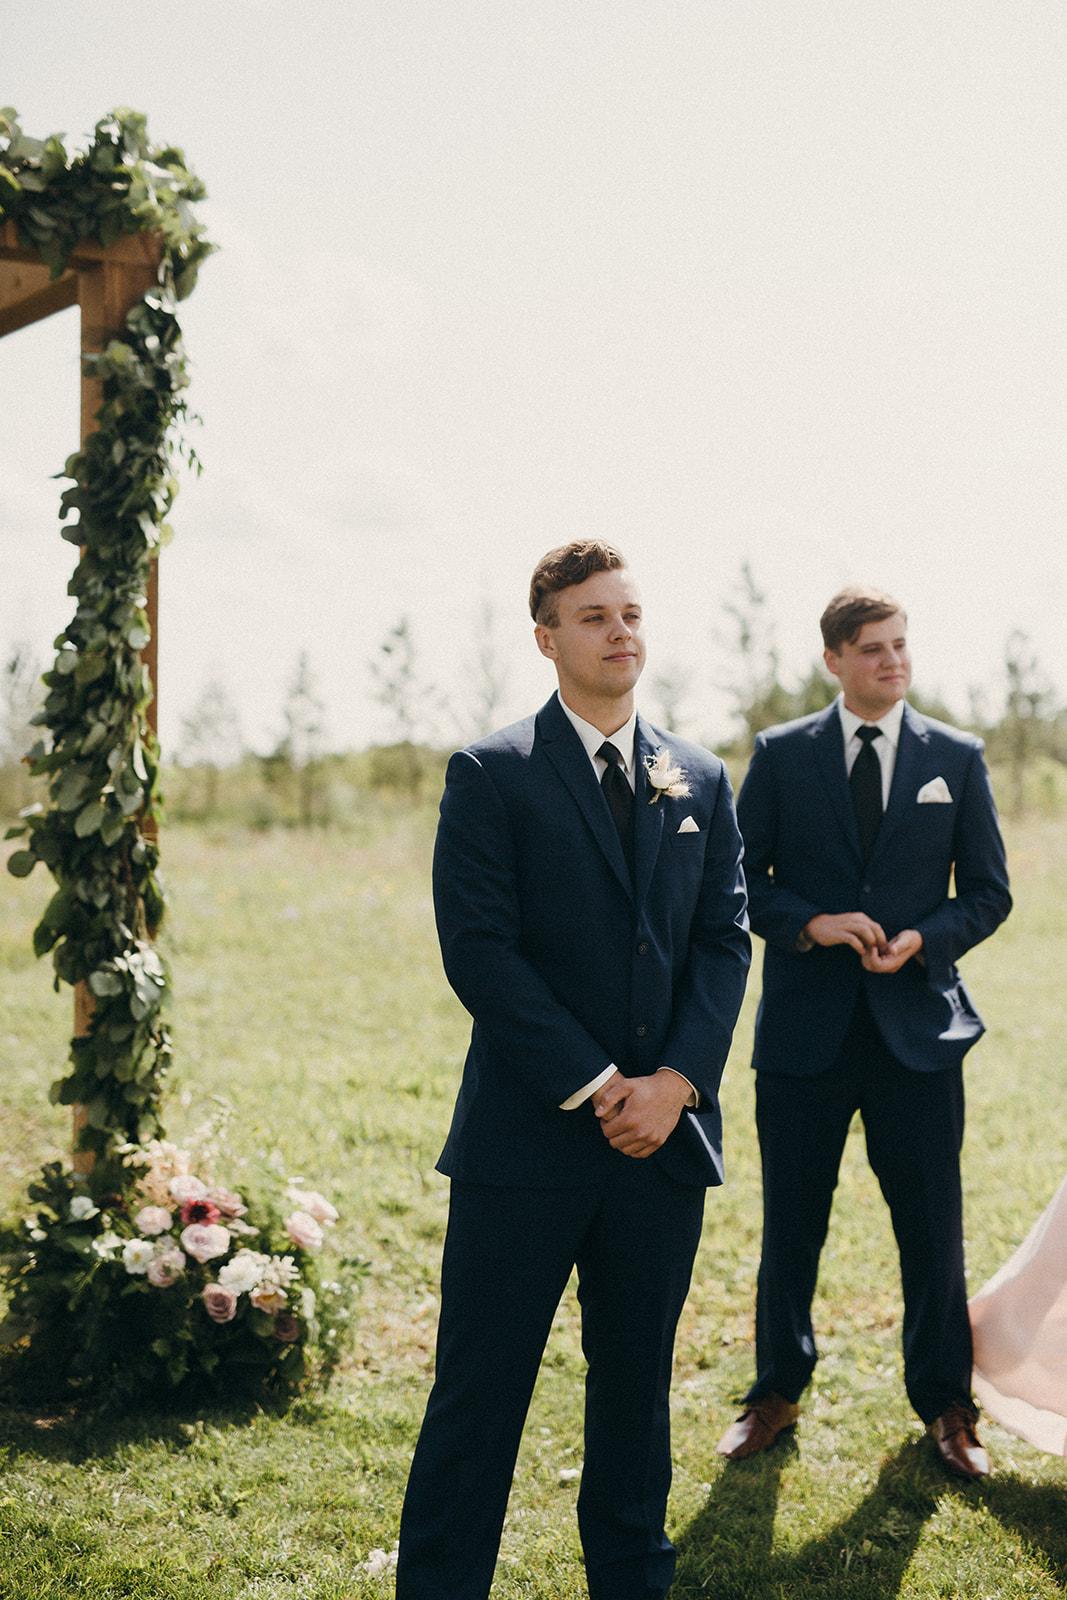 kaden_justine_wedding_1159.jpg